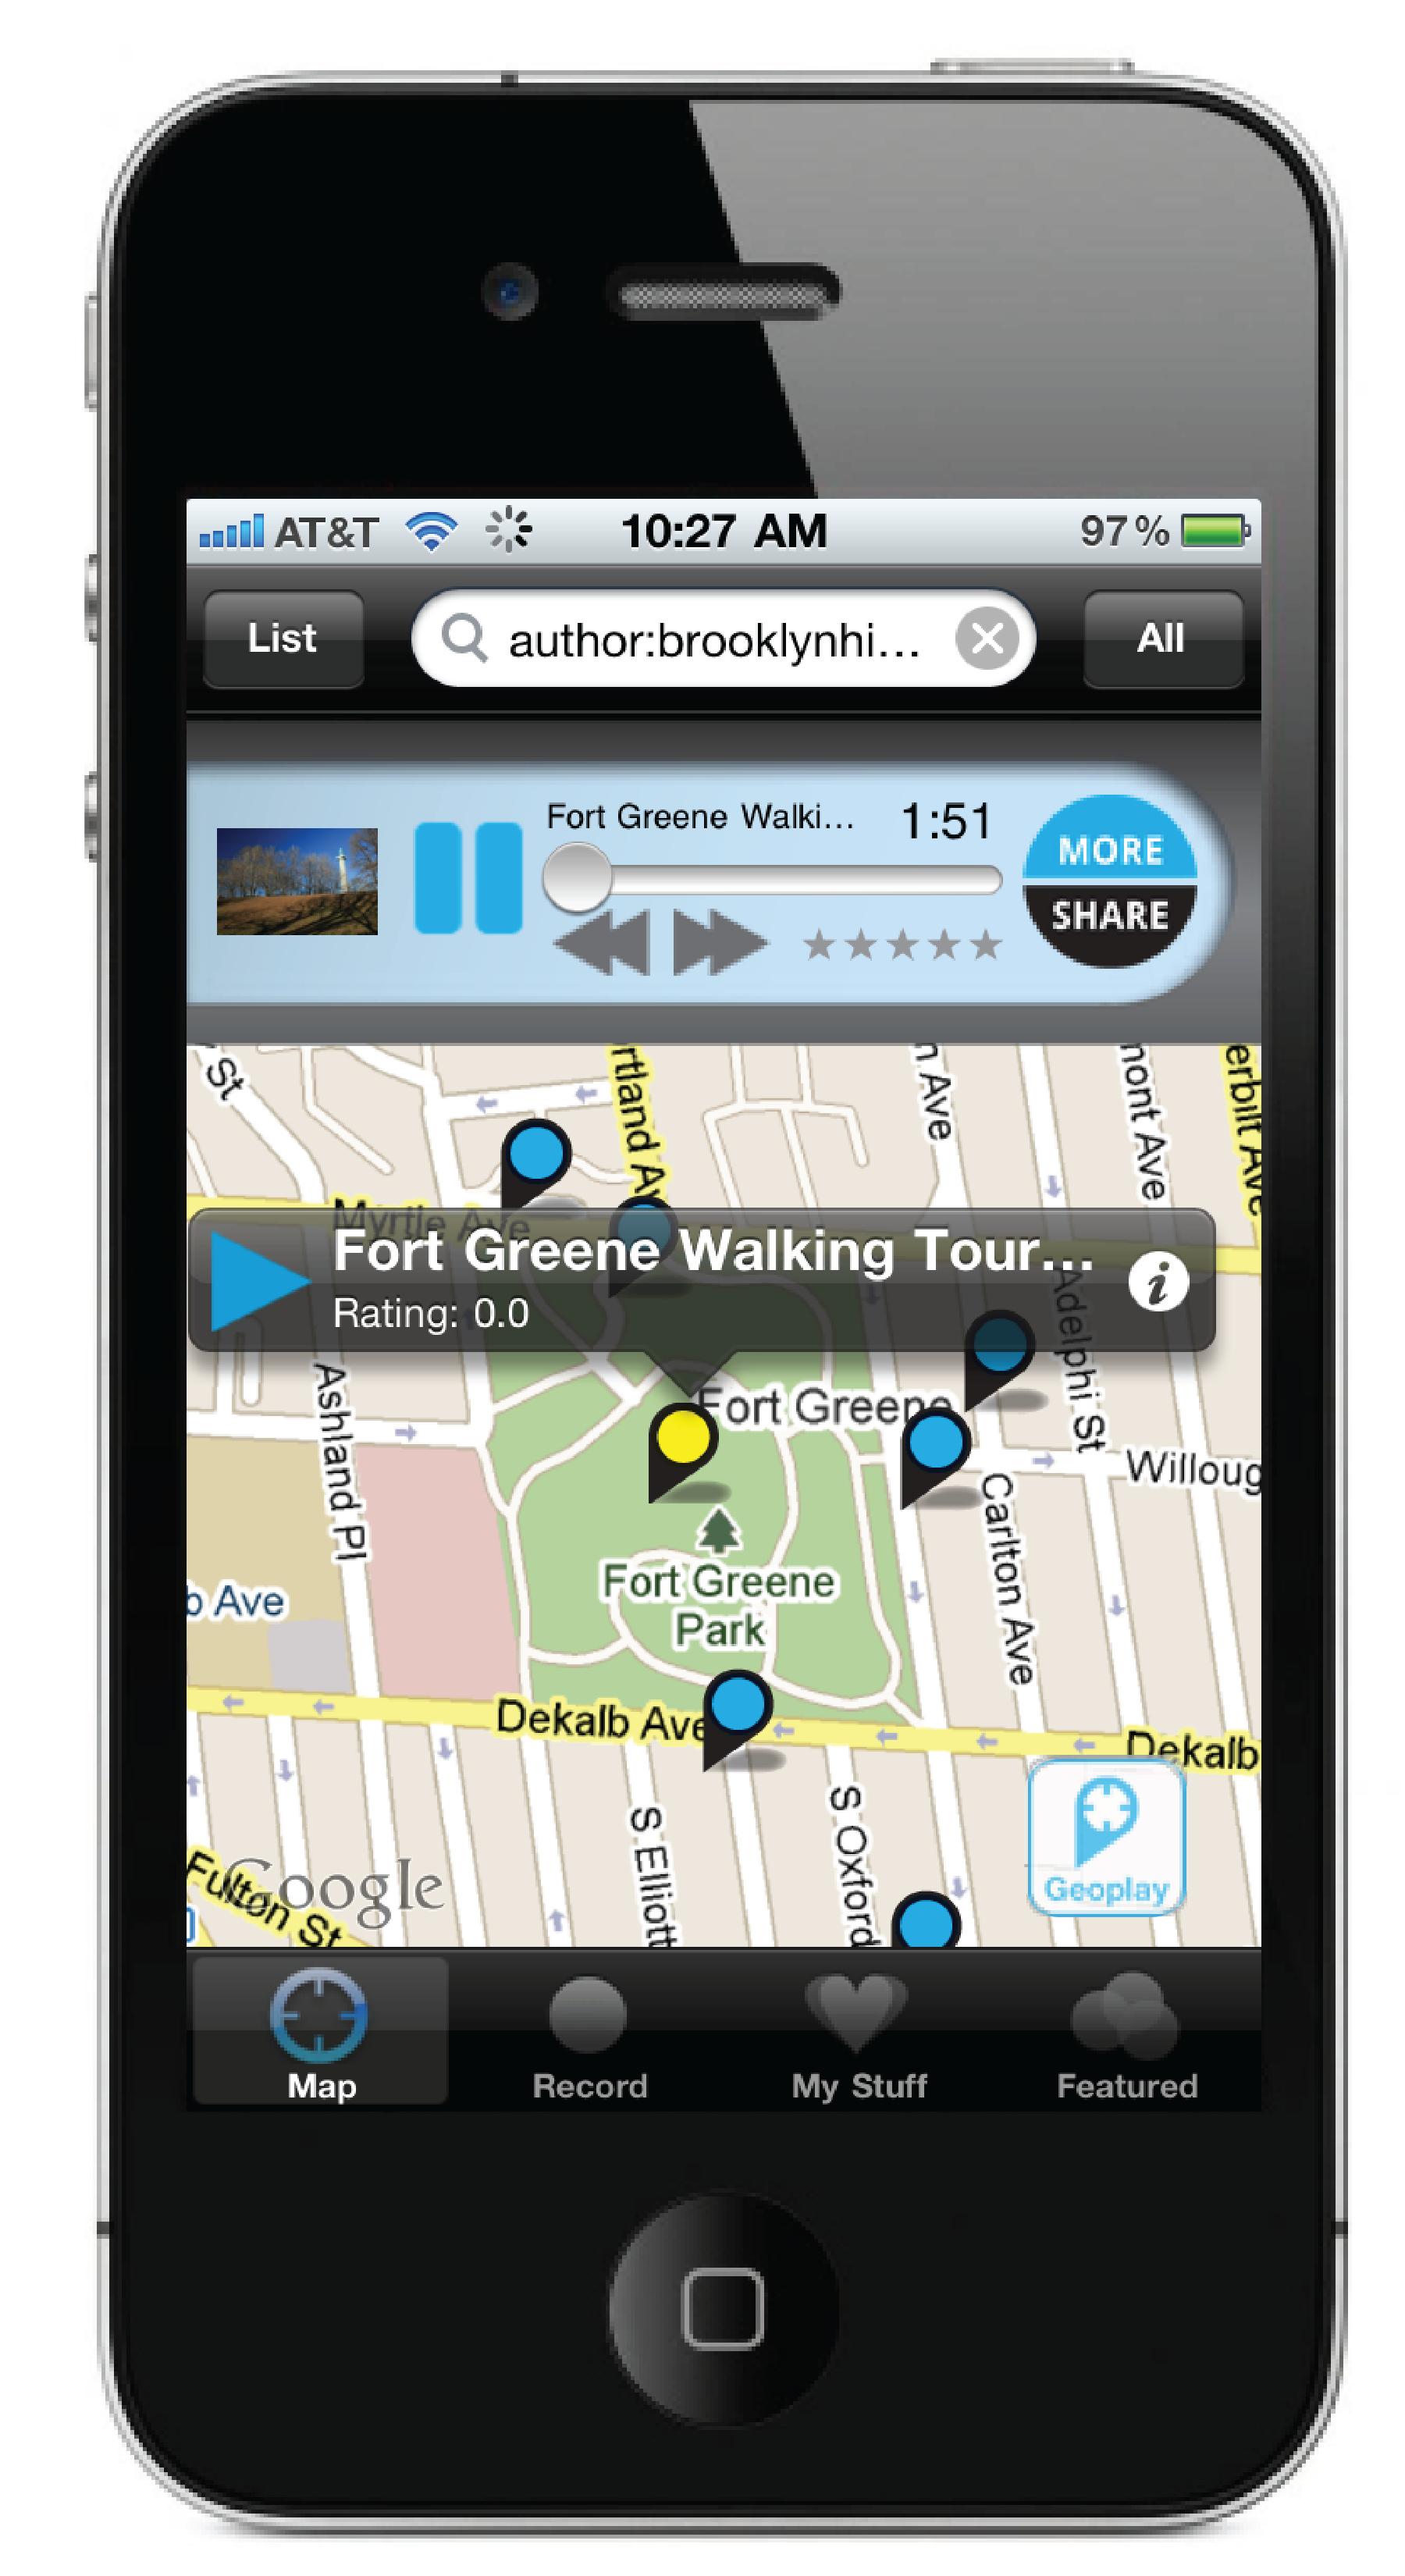 iphone picture app